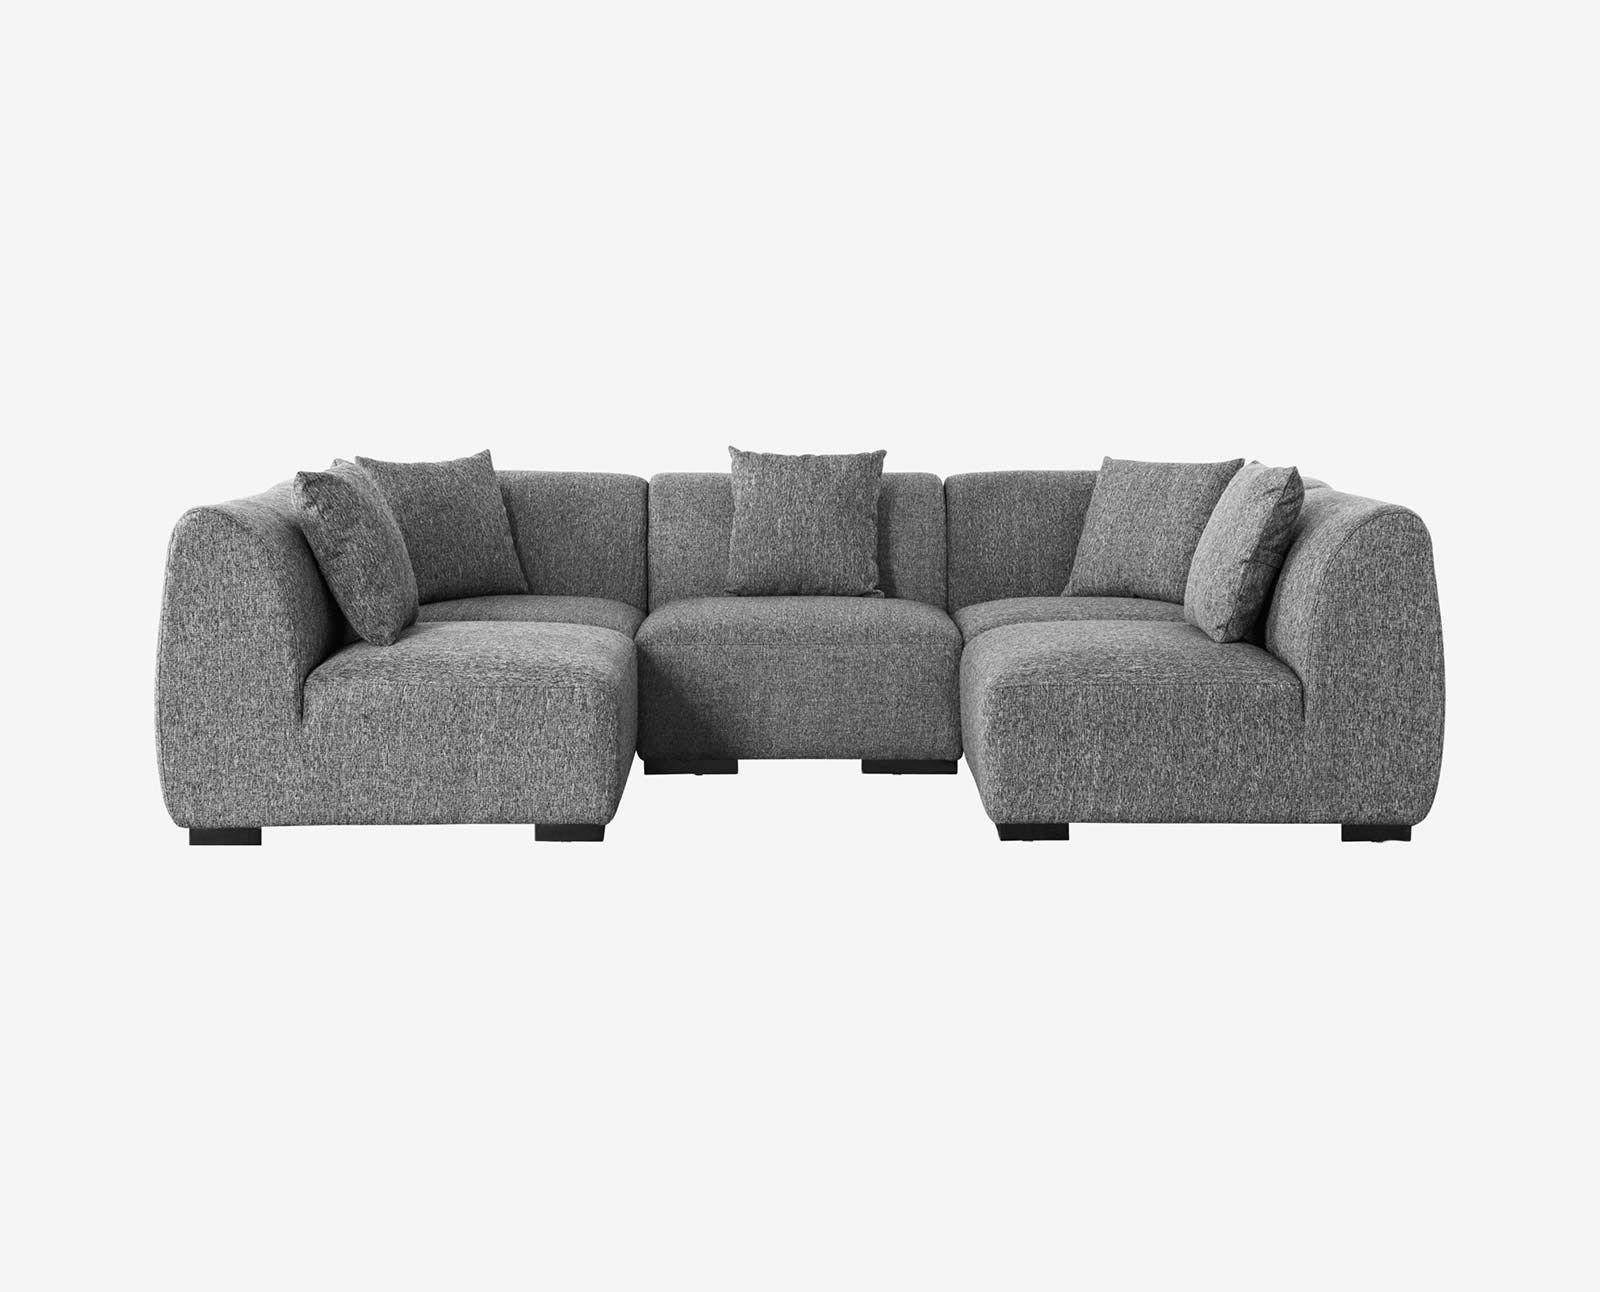 Kelsey Sectional - Sectionals - Scandinavian Designs | Furniture ...